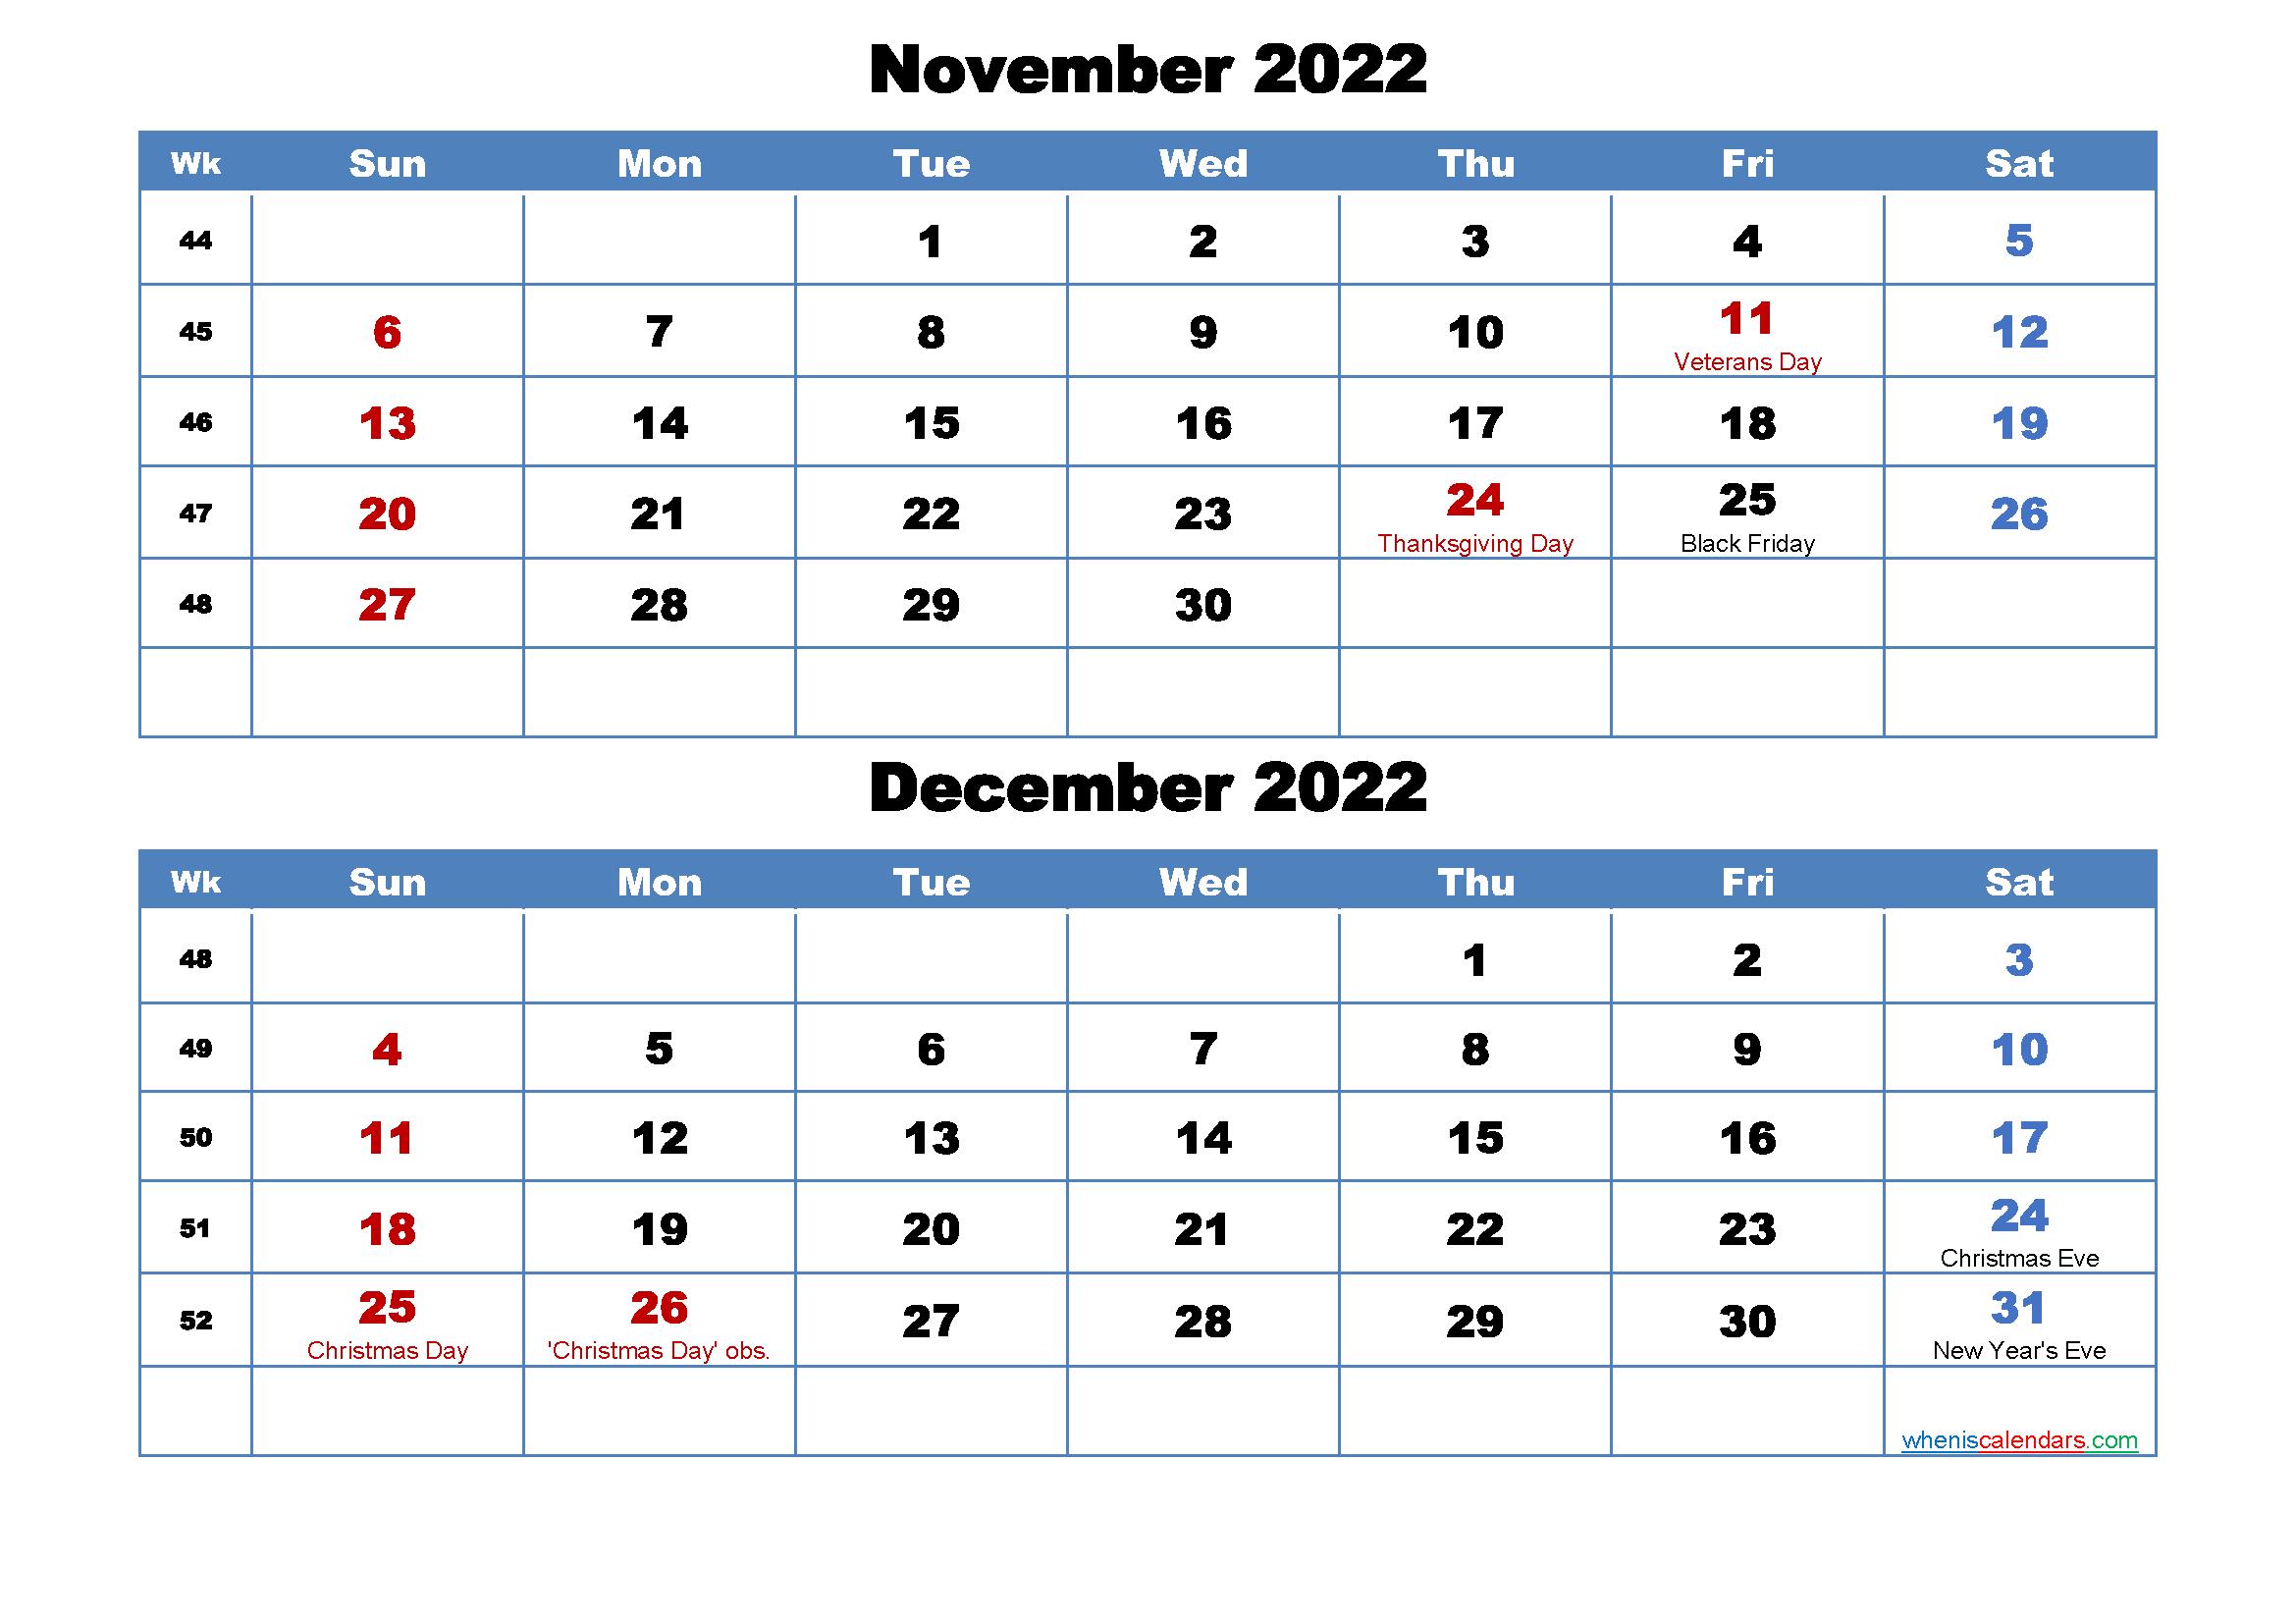 November December 2022 Calendar.Printable Calendar November And December 2022 Word Pdf Free Printable 2021 Monthly Calendar With Holidays